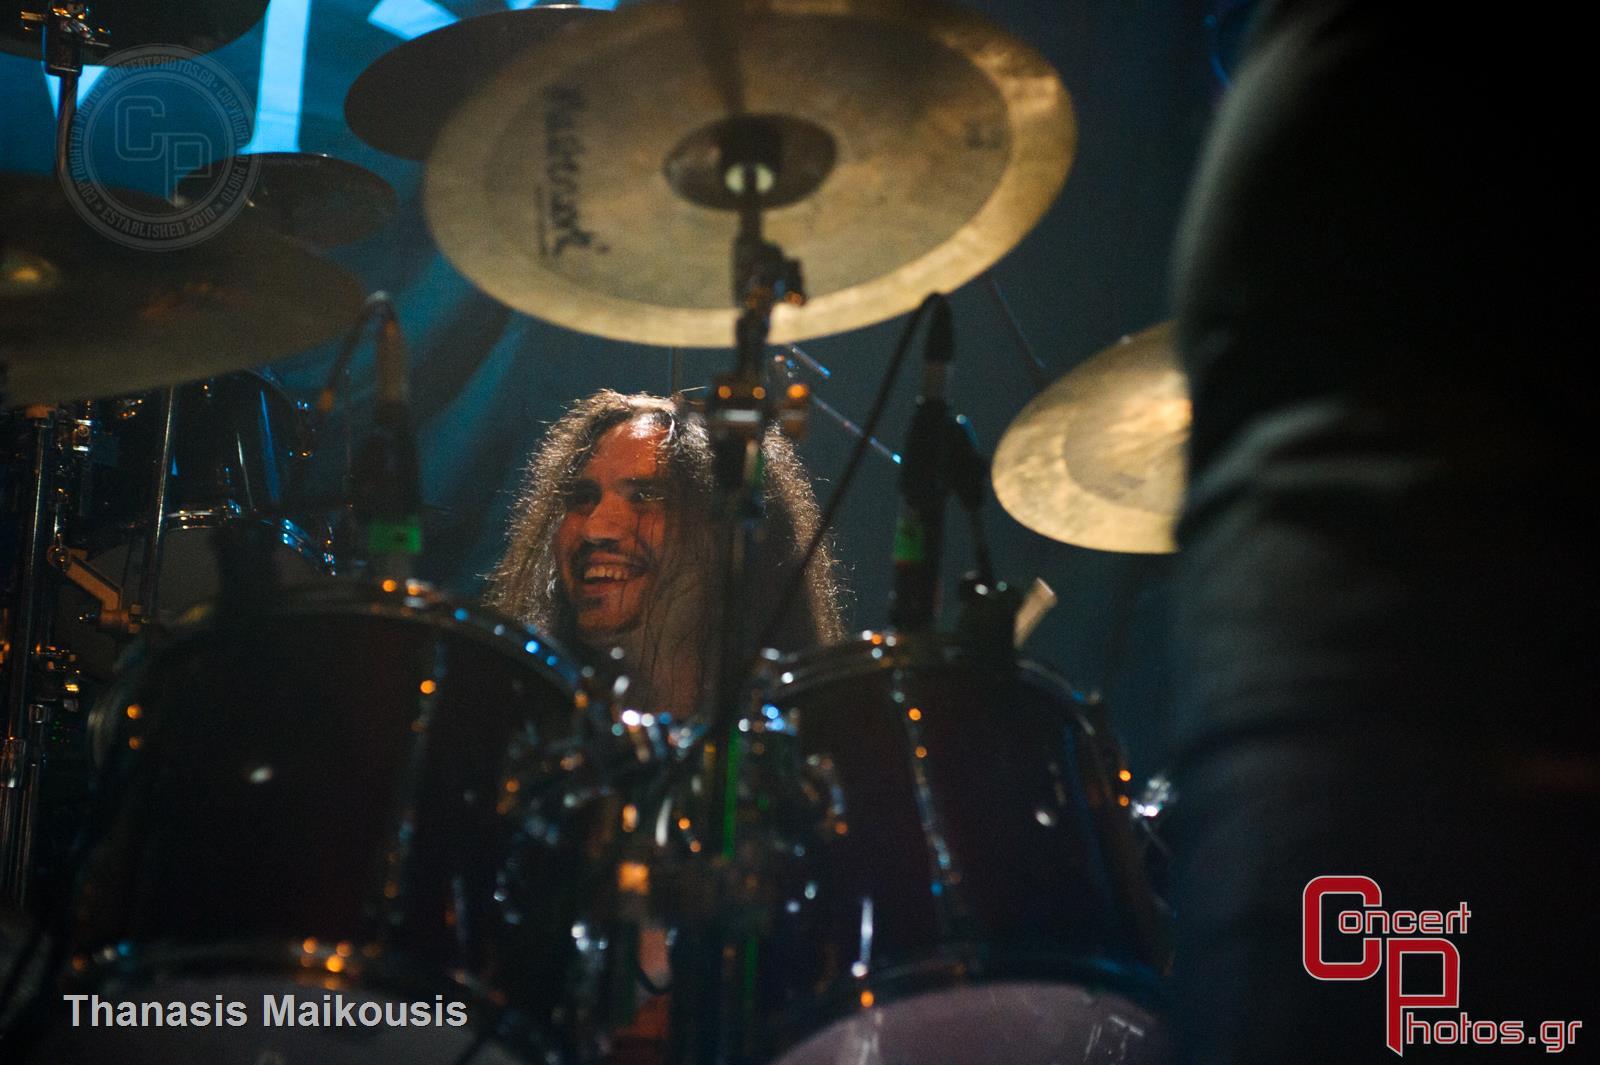 Saxon & Innerwish -Saxon Innerwish Gagarin photographer: Thanasis Maikousis - concertphotos_20141025_21_13_45